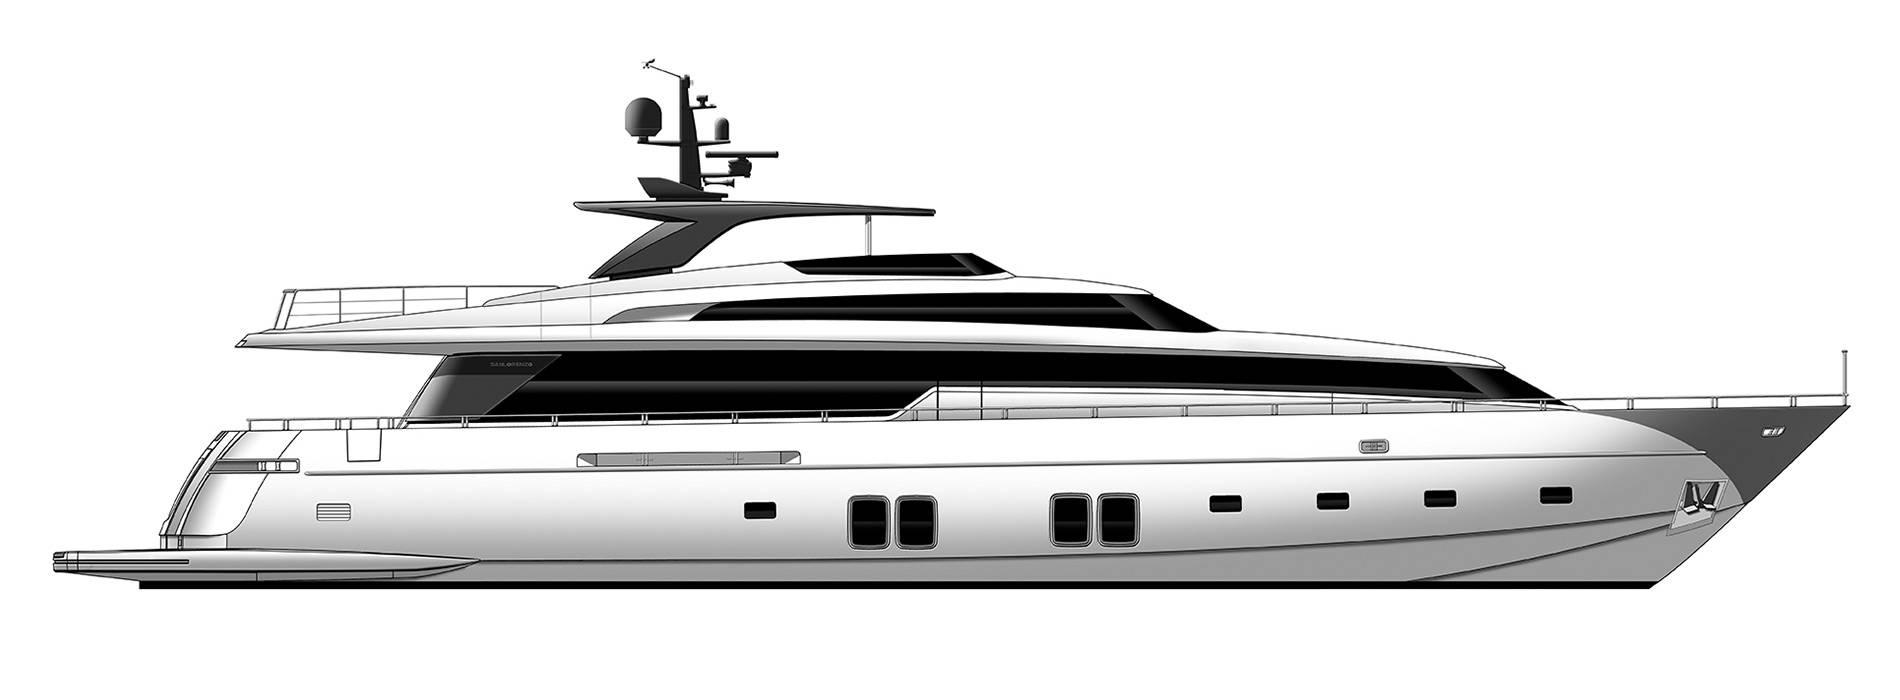 Sanlorenzo Yachts SL106 Perfil